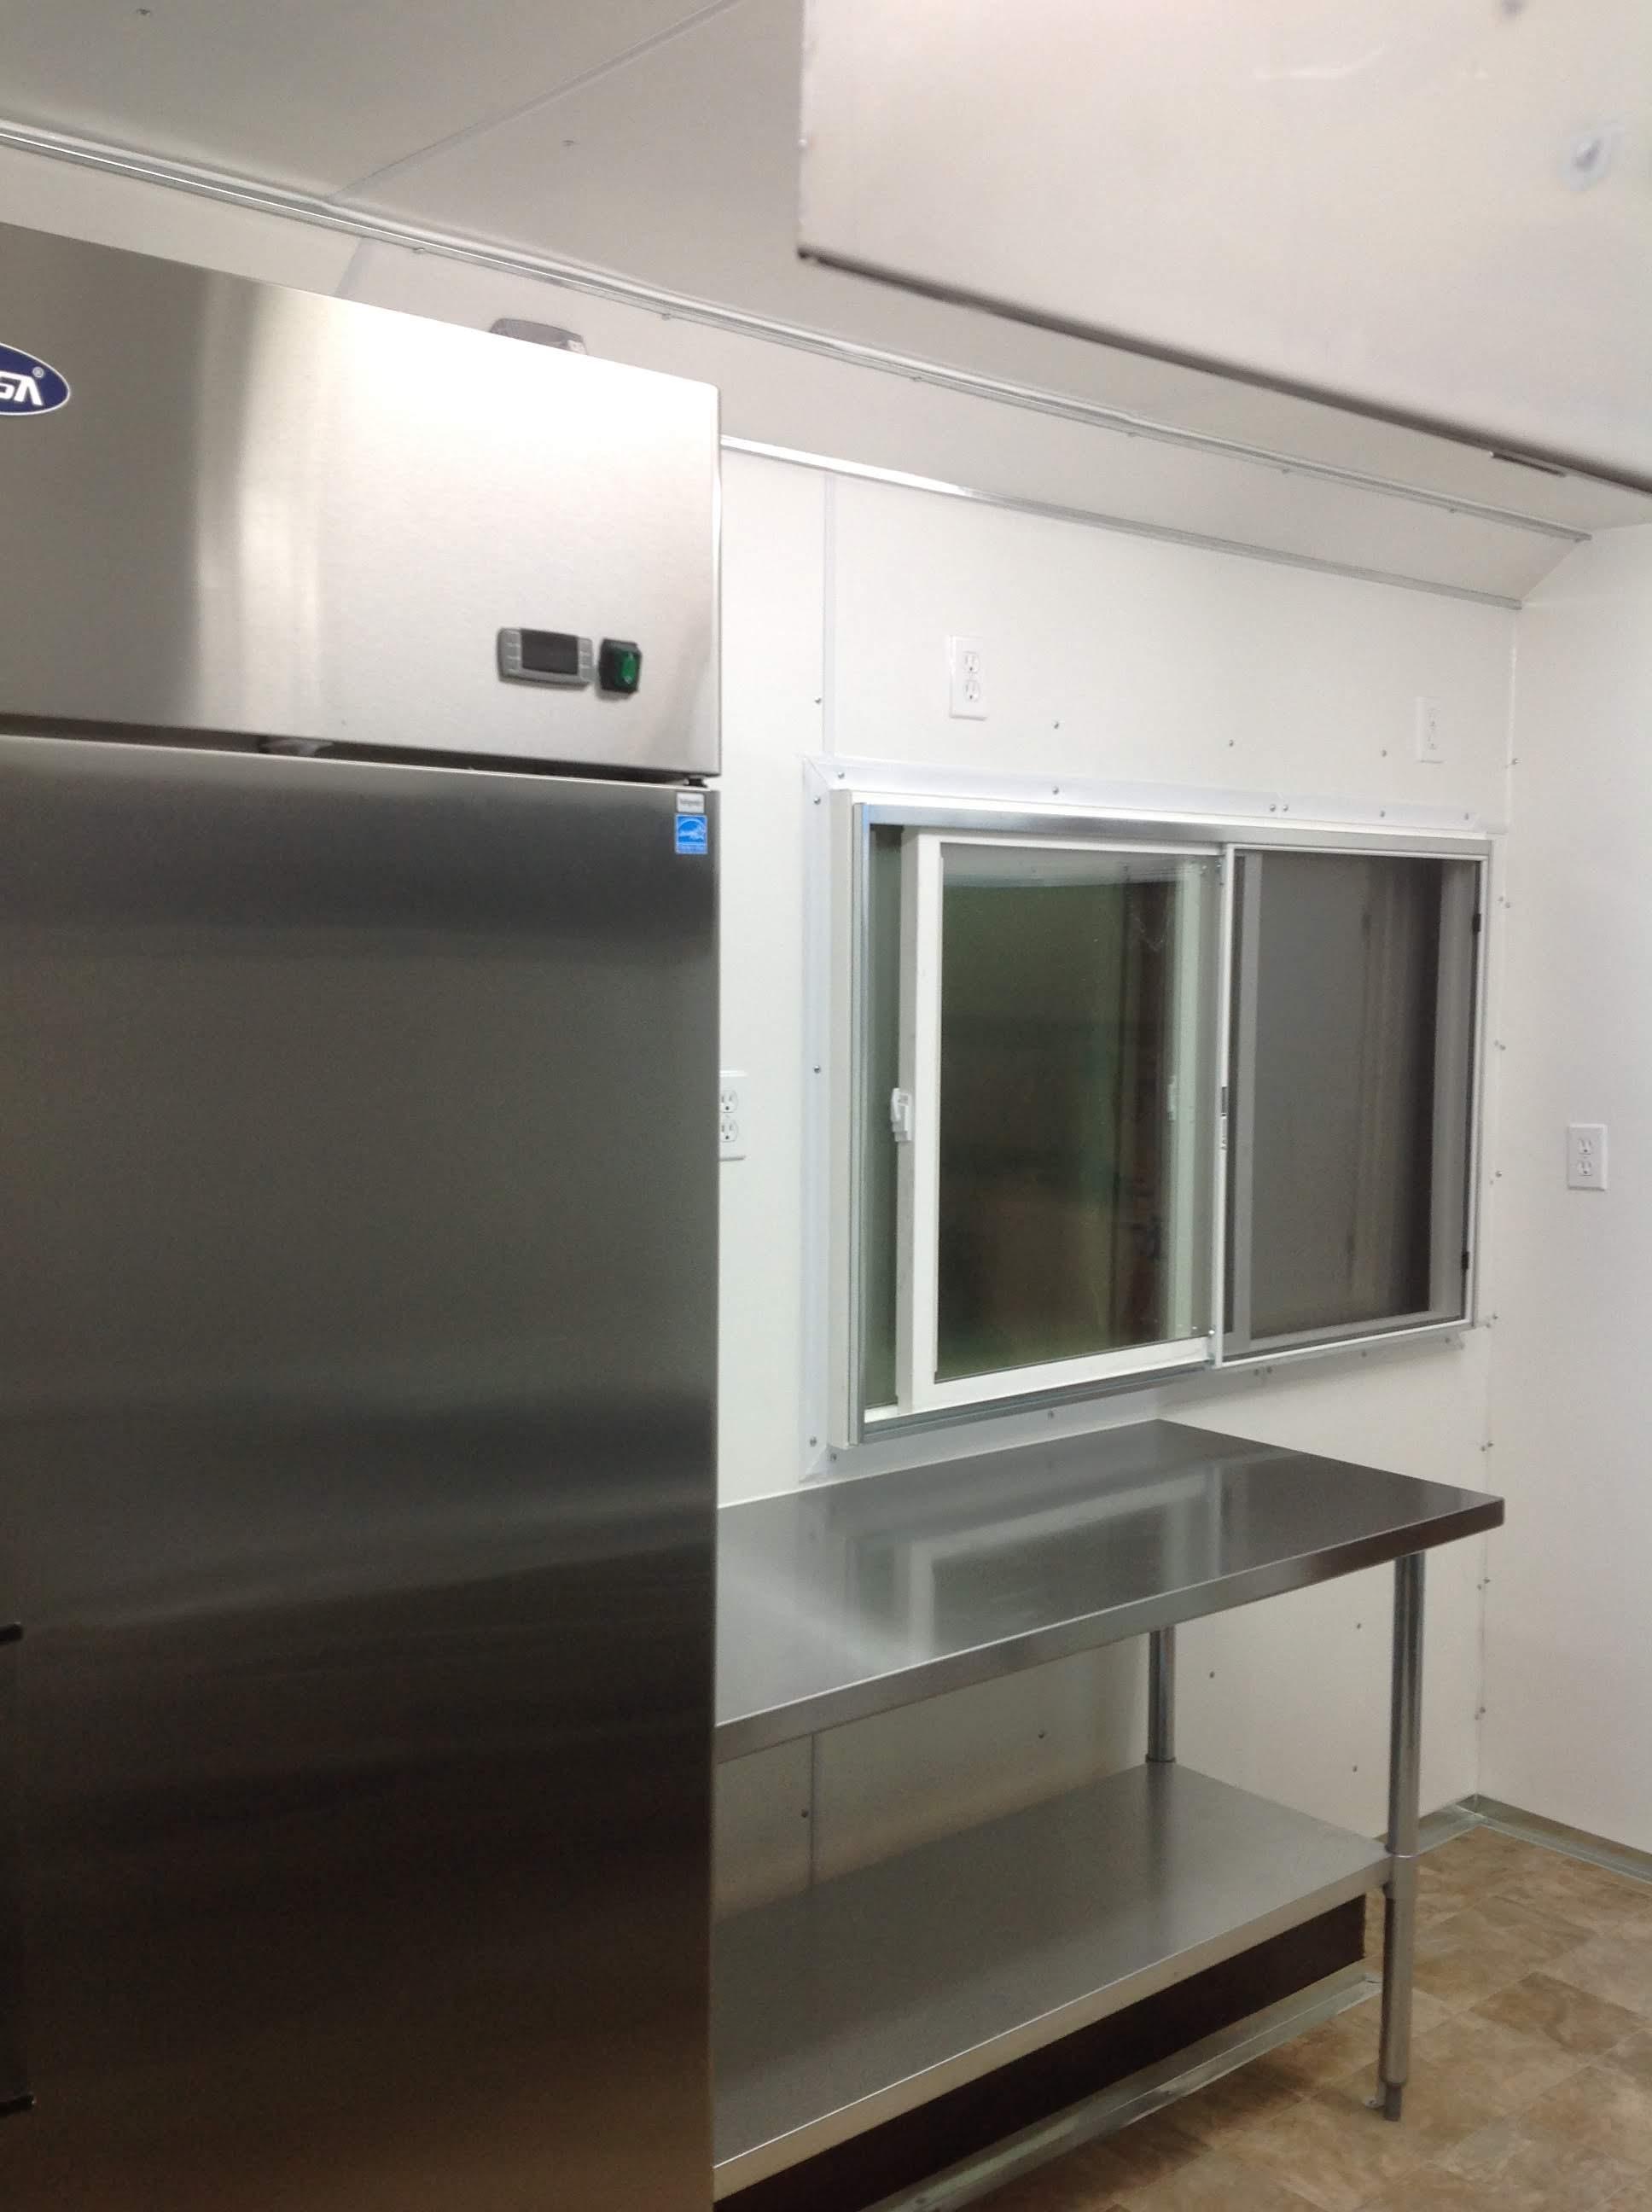 Trailer 10 Custom Kitchen Foodtruck 7